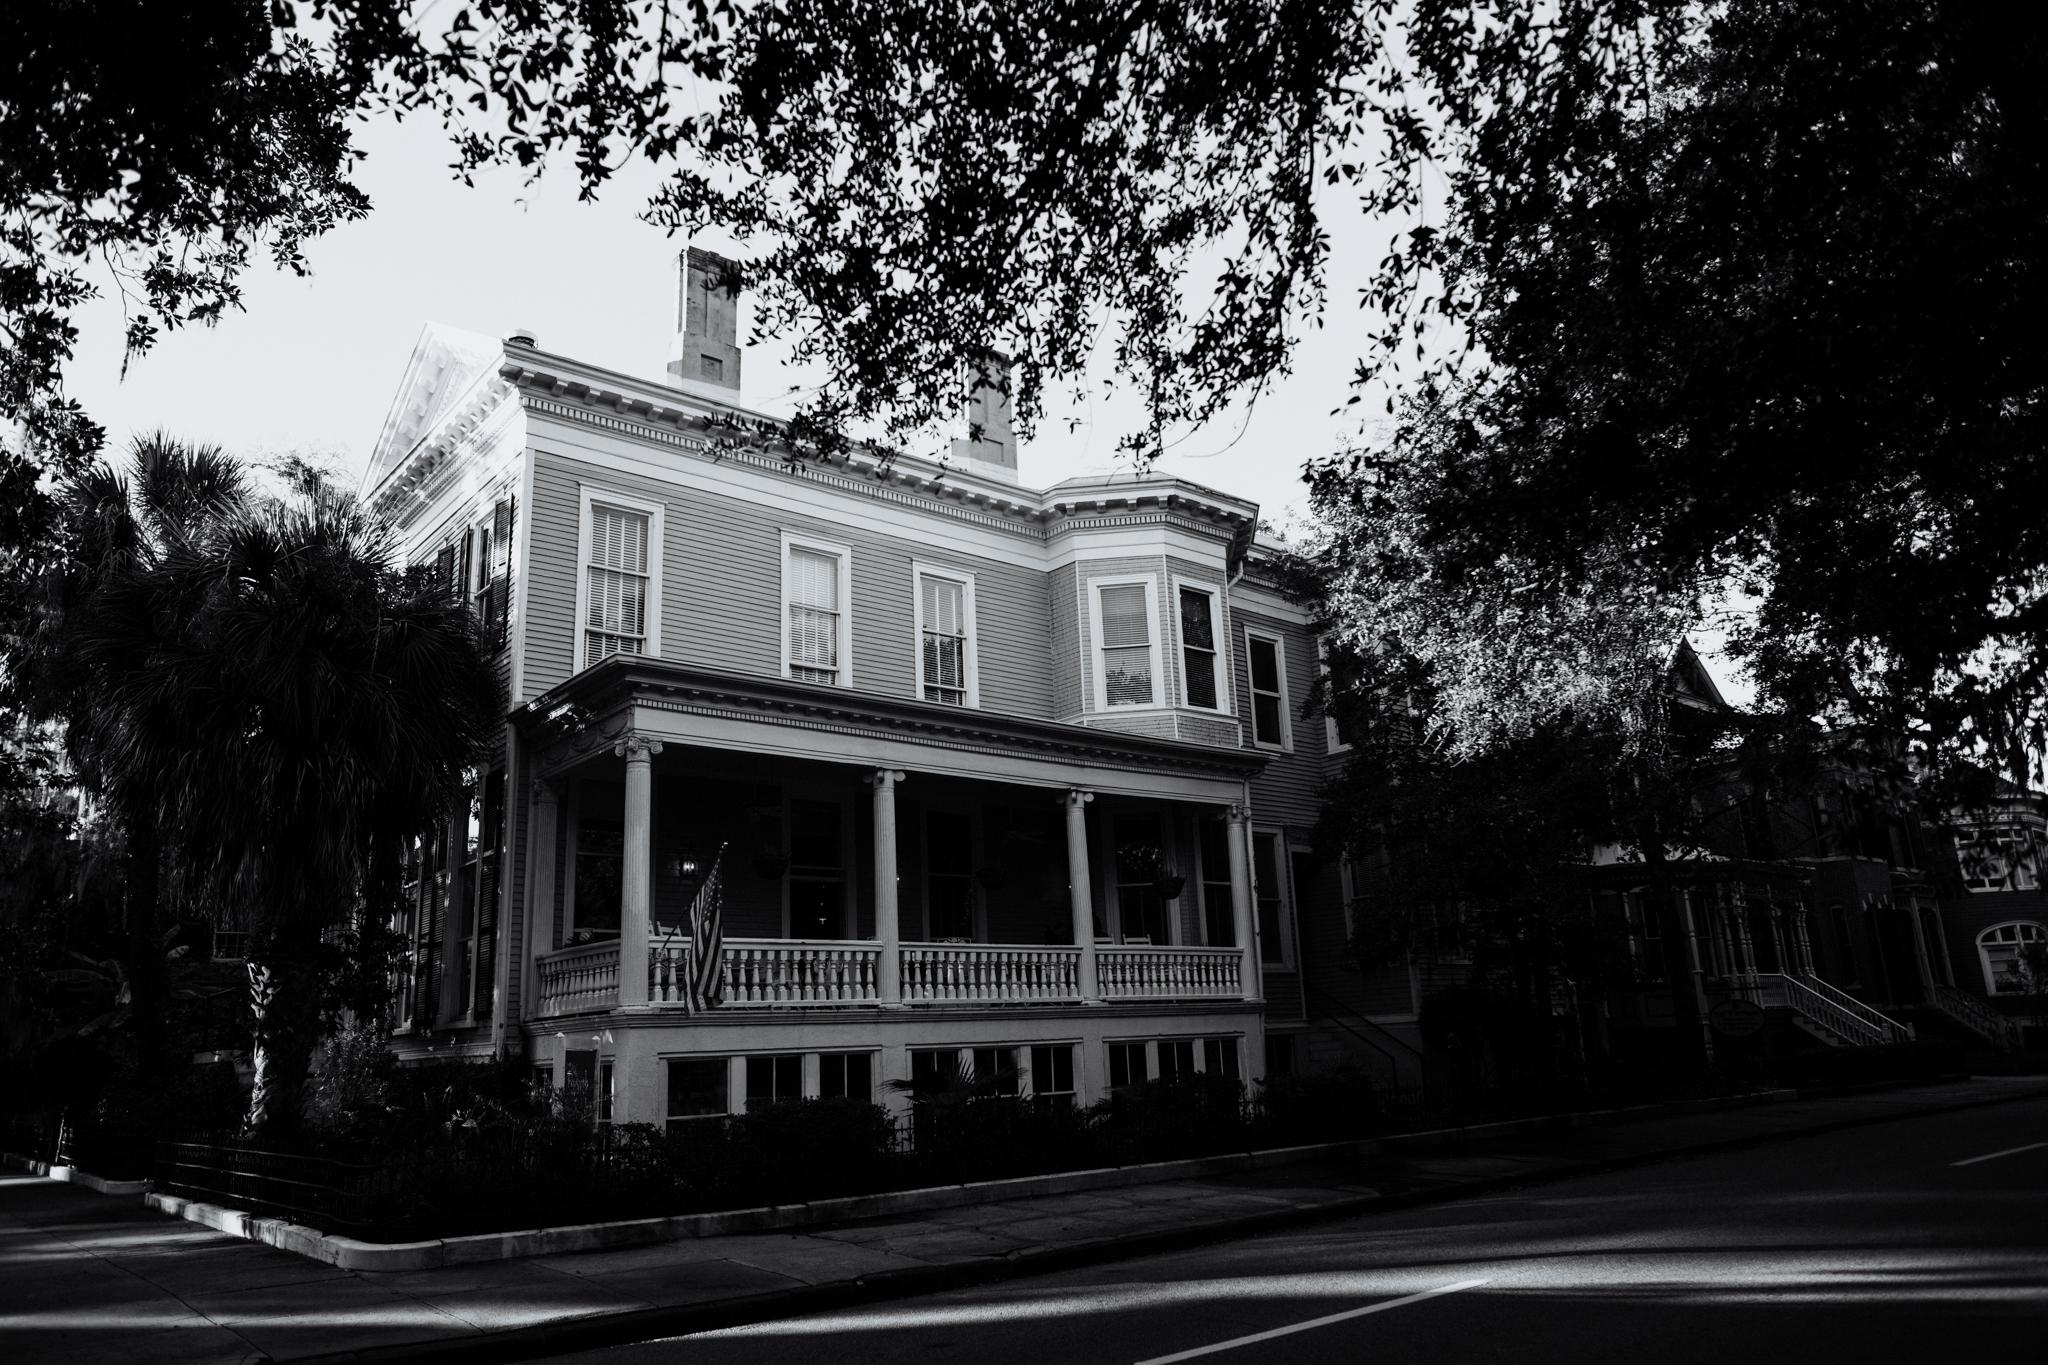 Forsyth Park Inn - Savannah Georgia Travel - Destination Elopement Photographer - Vow of the Wild